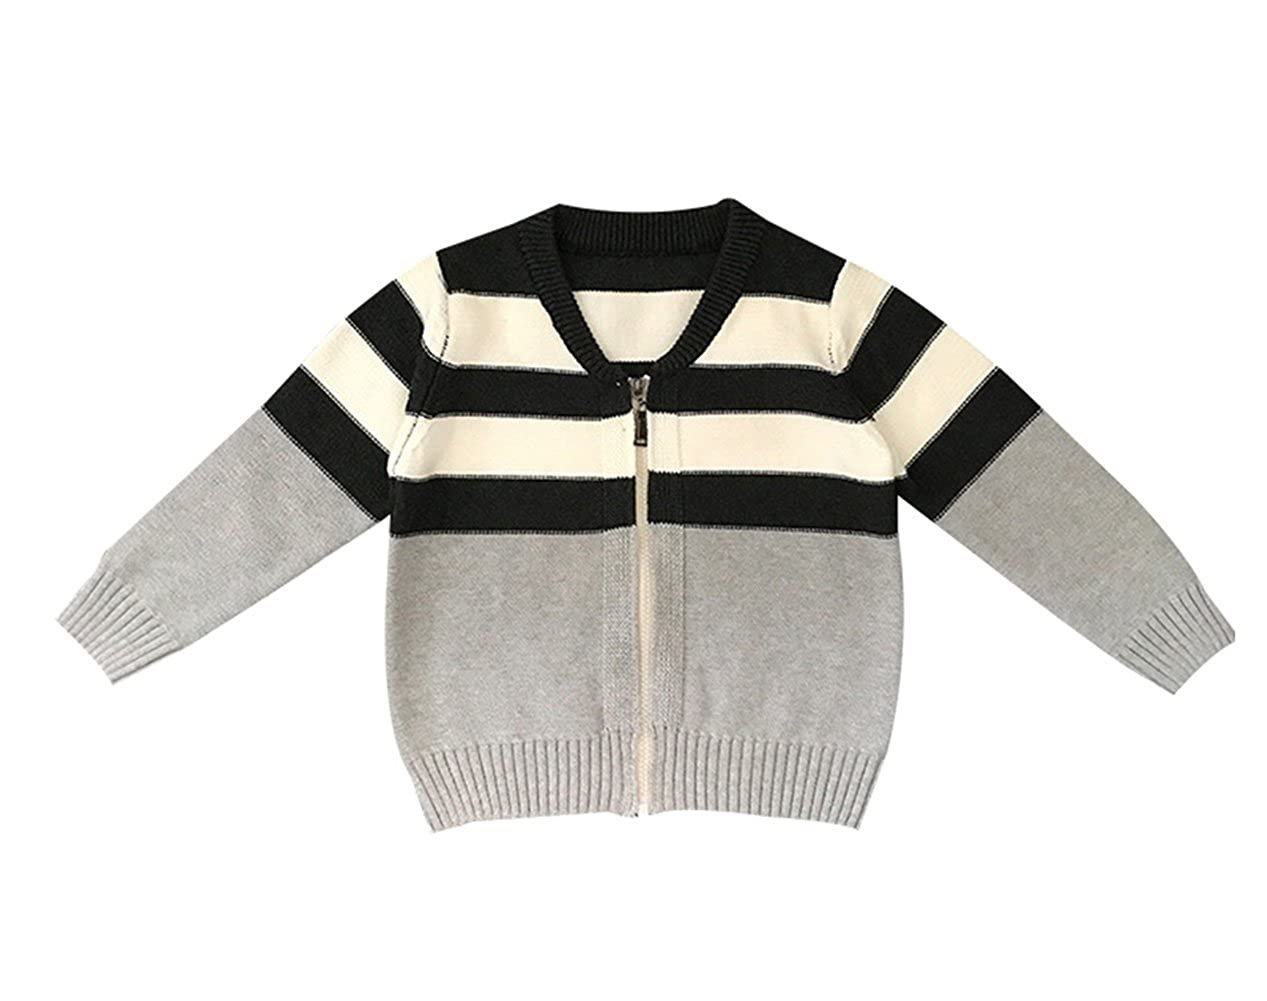 TAIYCYXGAN Baby Boys Girls Knit Cardigan Sweater Toddlers Kids Stripe Zipper Sweater Jacket